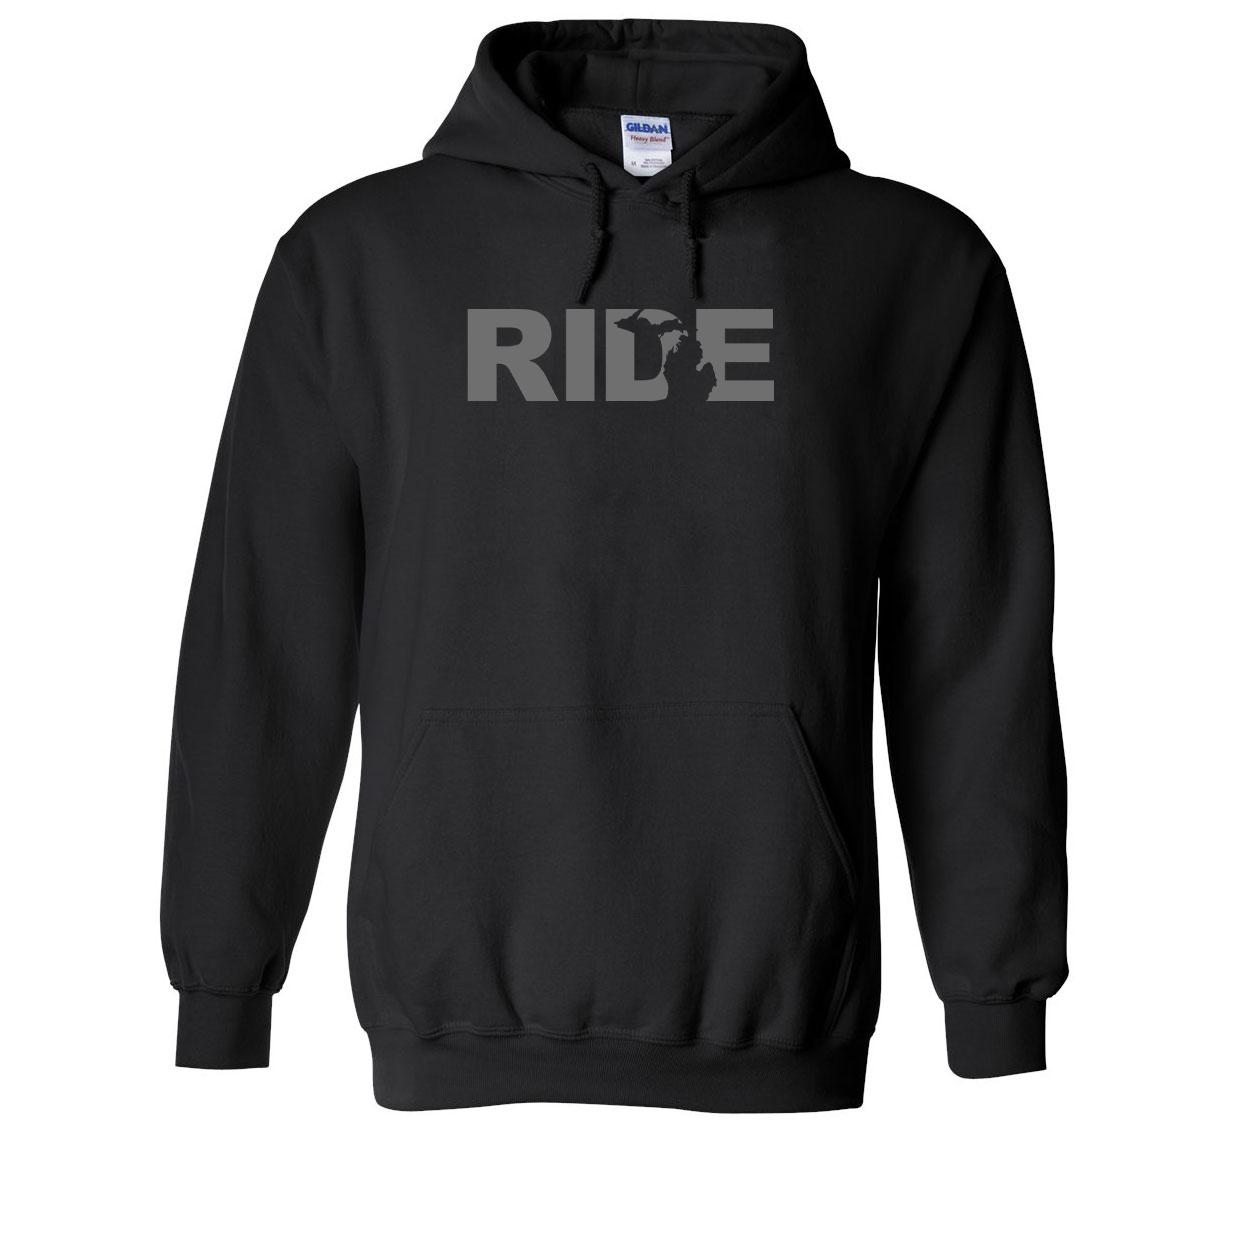 Ride Michigan Classic Sweatshirt Black (Gray Logo)